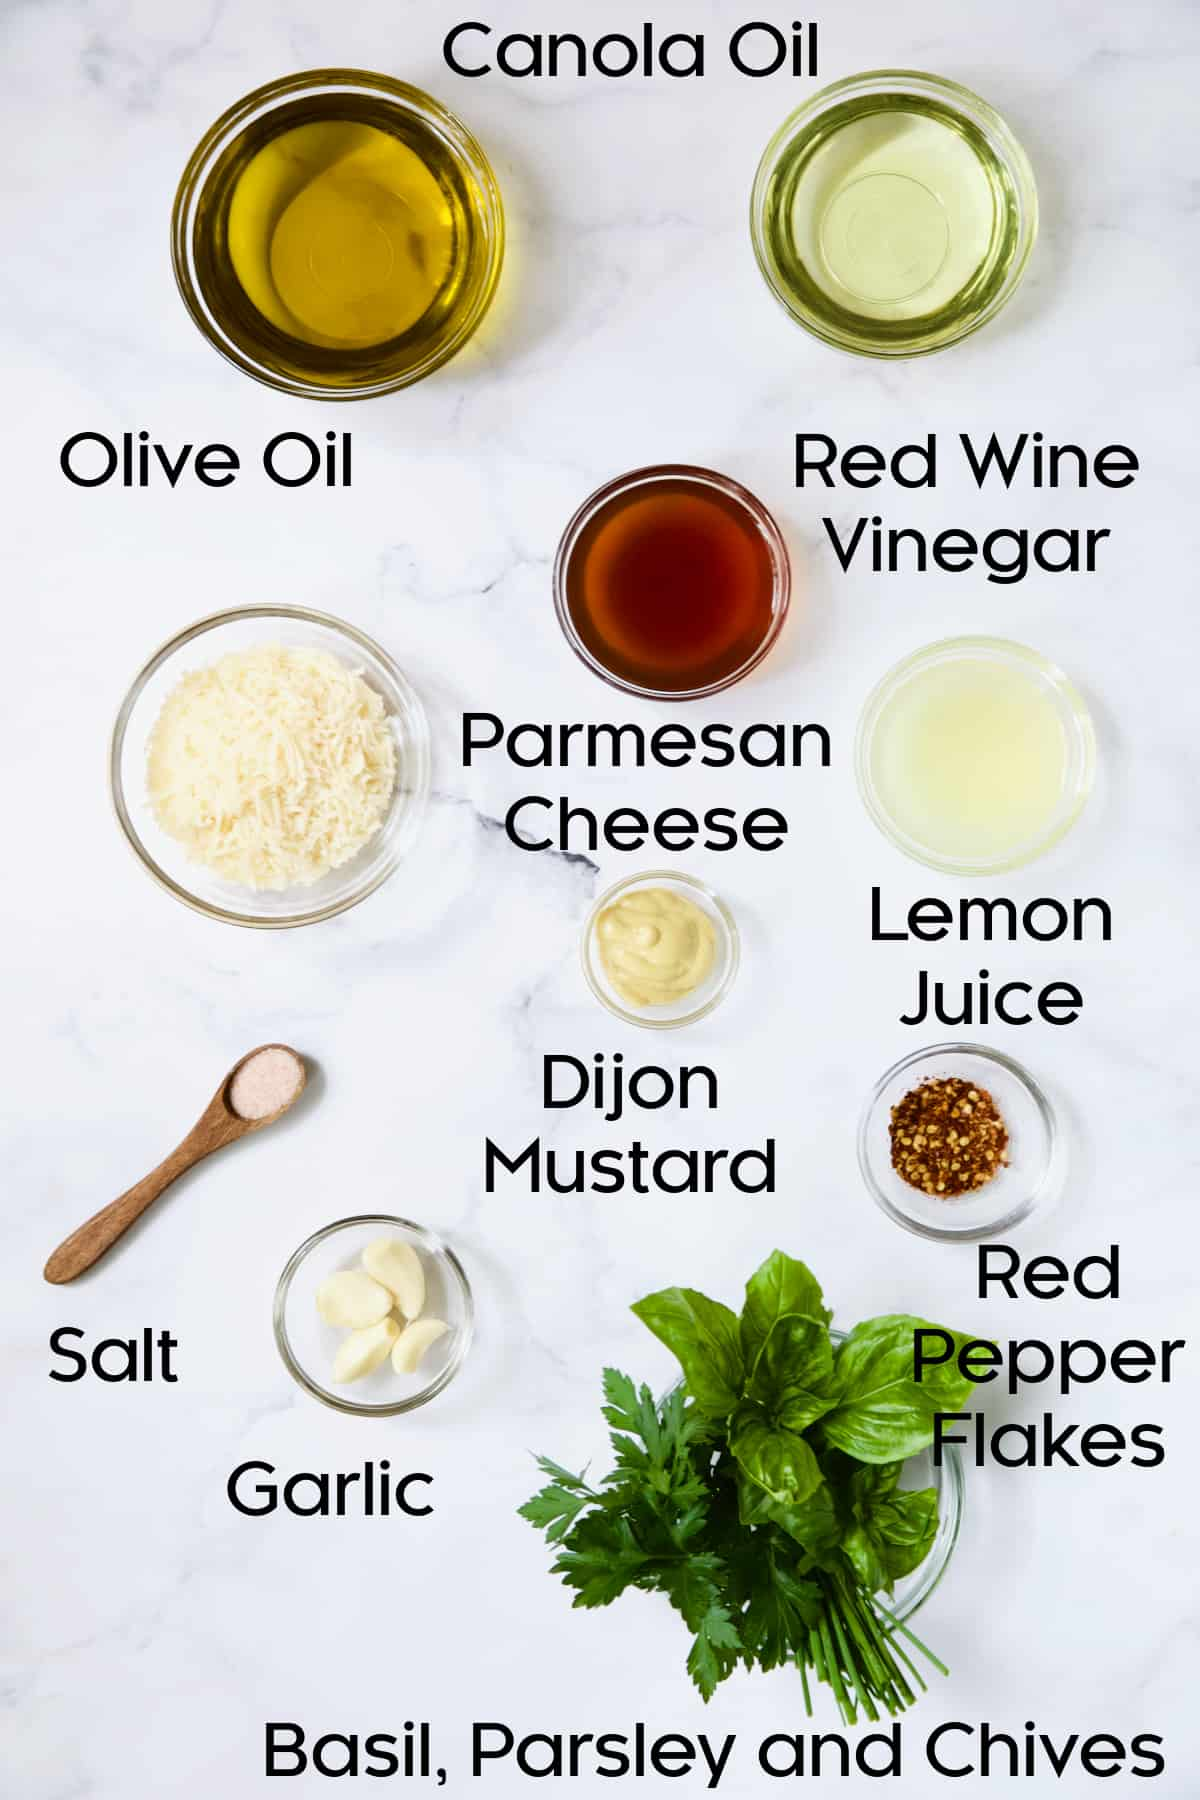 Ingredients for Parmesan Herb Vinaigrette in glass bowls.